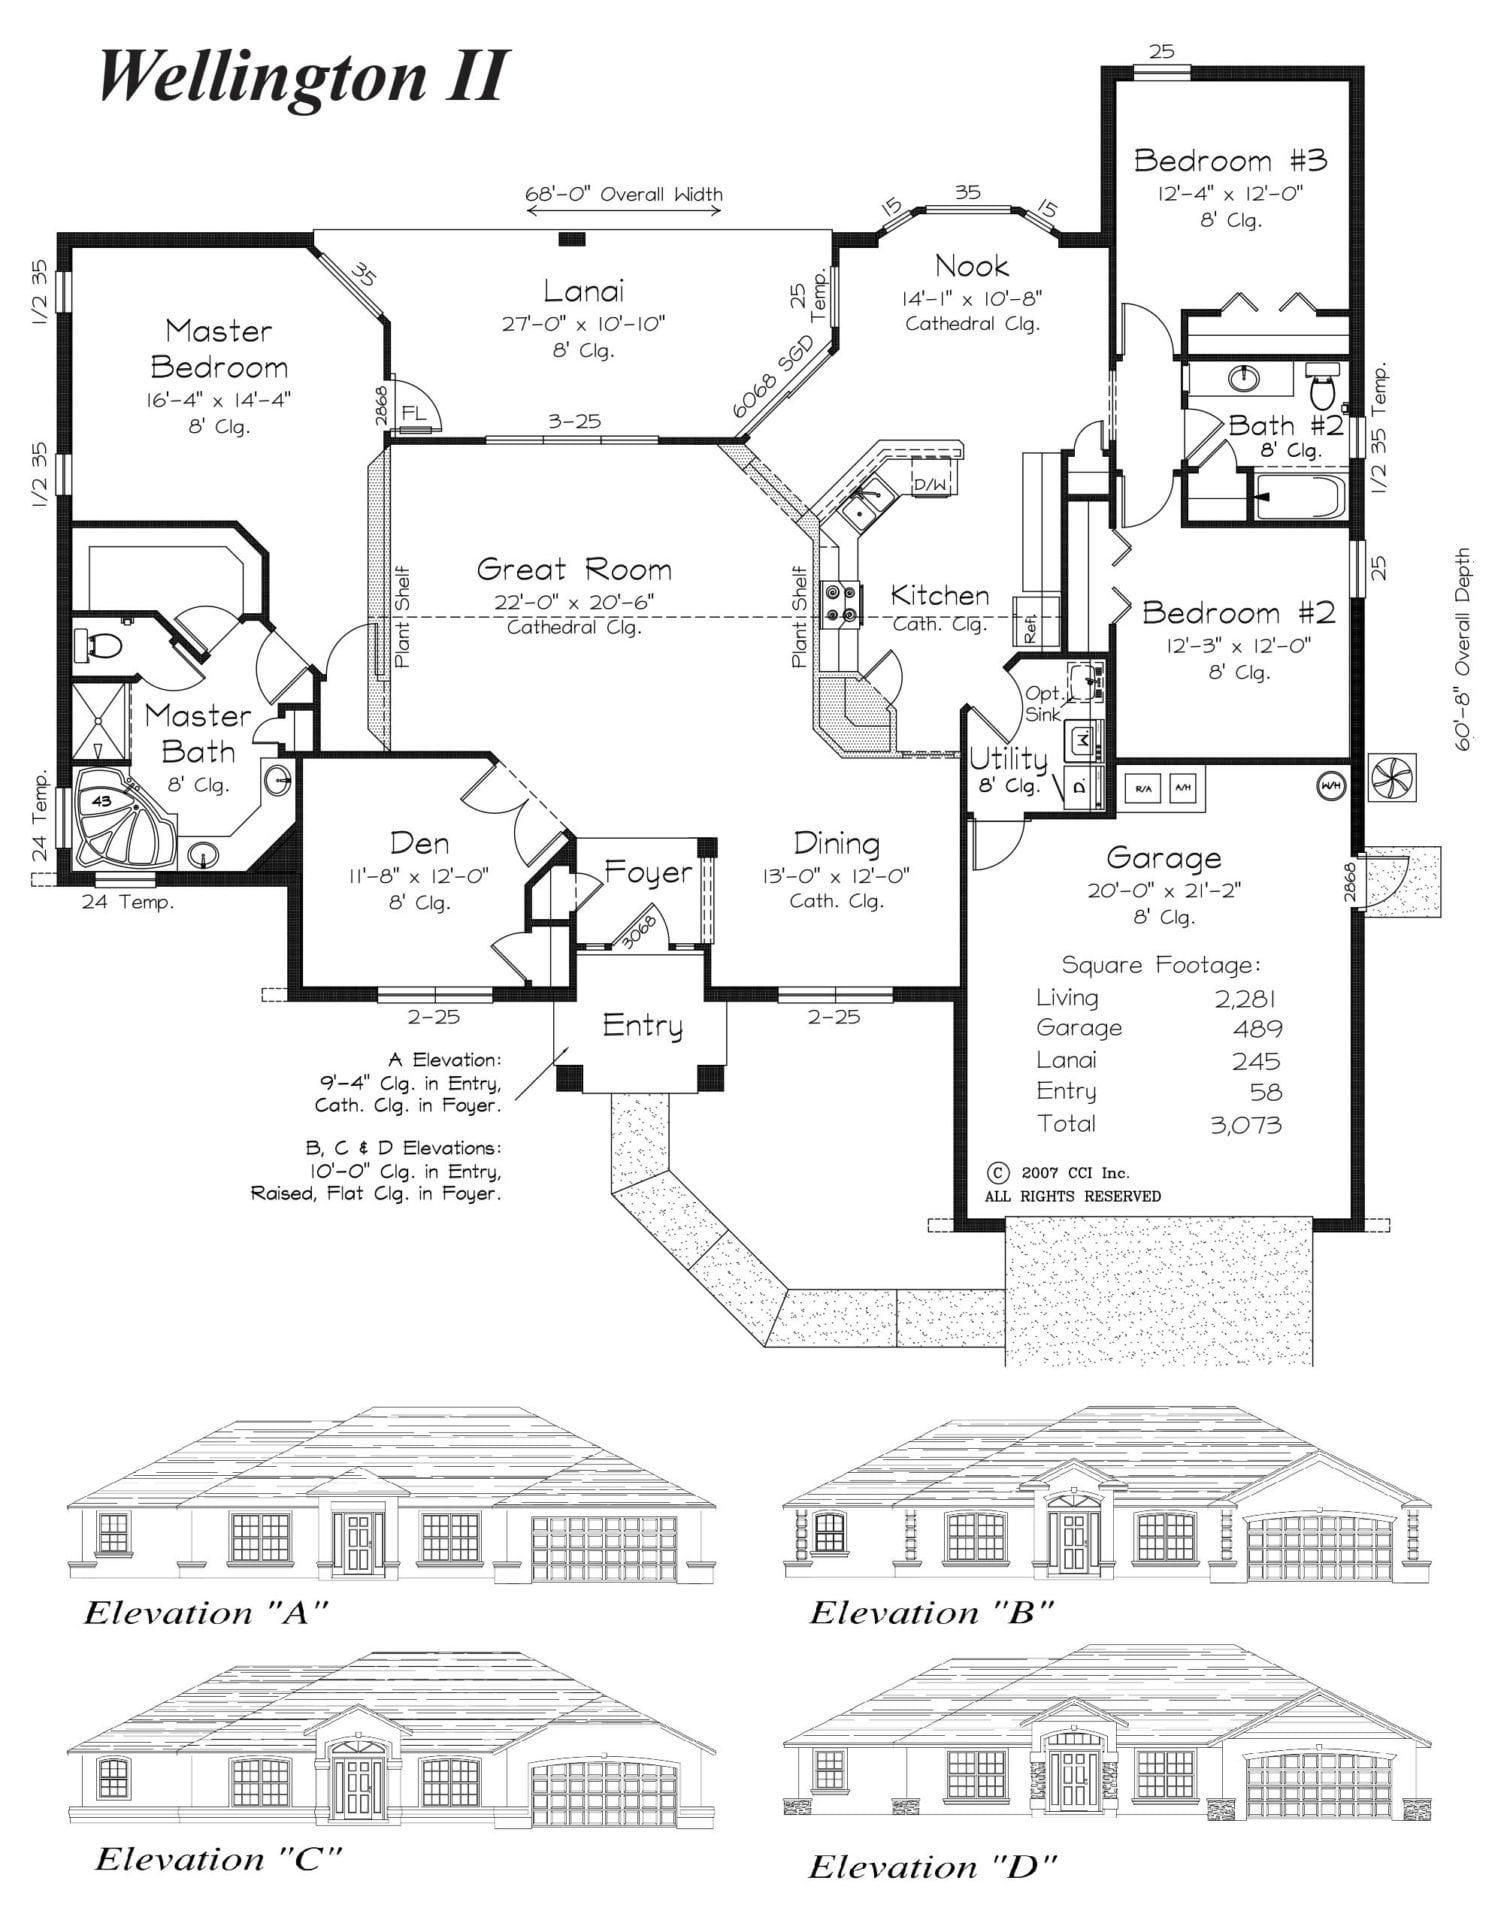 Wellington II Floor Plan - Curington Homes - Ocala Florida Contractor